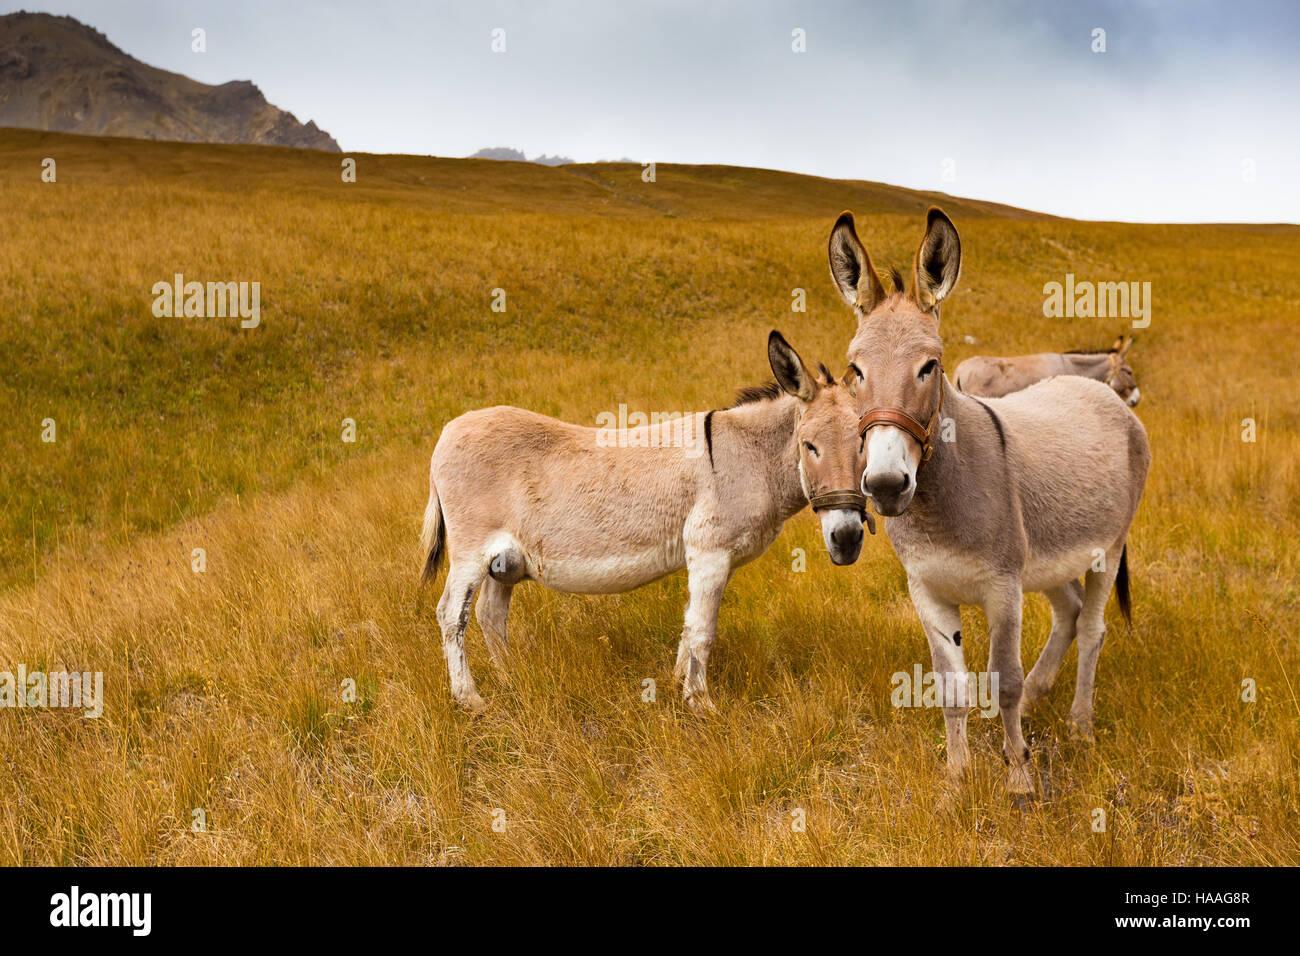 Esel, alpine Rasen, Col des Thures. Vallée Etroite. Stockbild